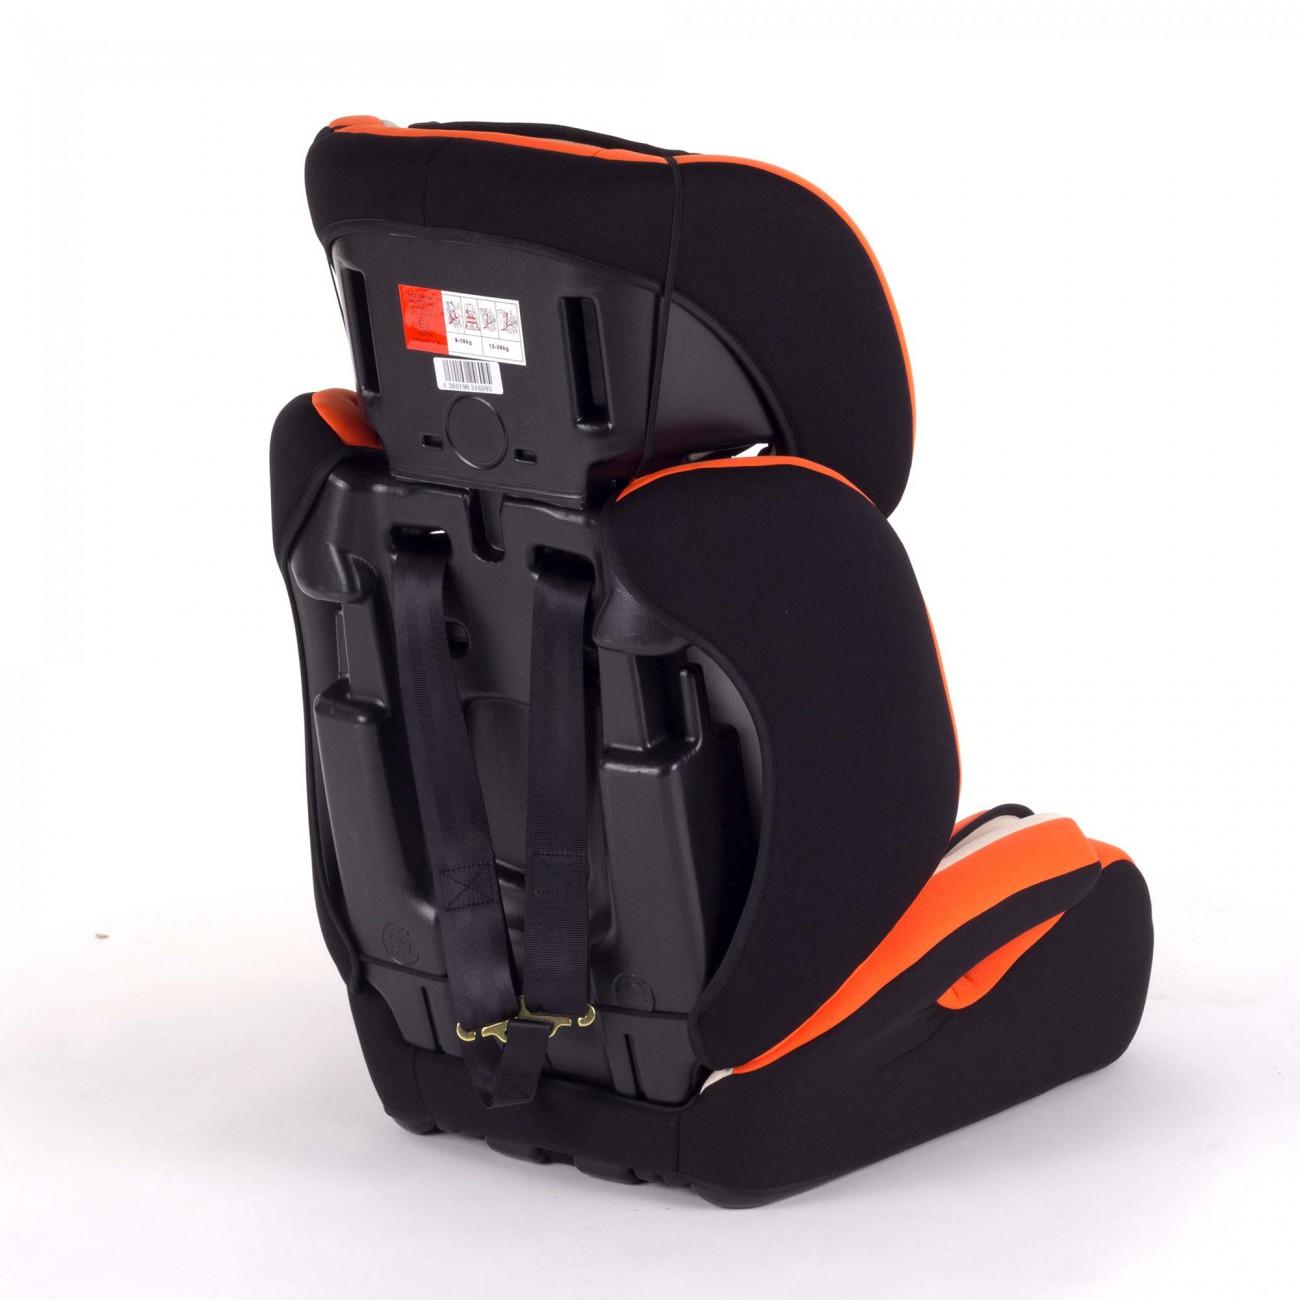 kindersitz 9 36 kg autokindersitz autositz gruppe 1 2 3. Black Bedroom Furniture Sets. Home Design Ideas